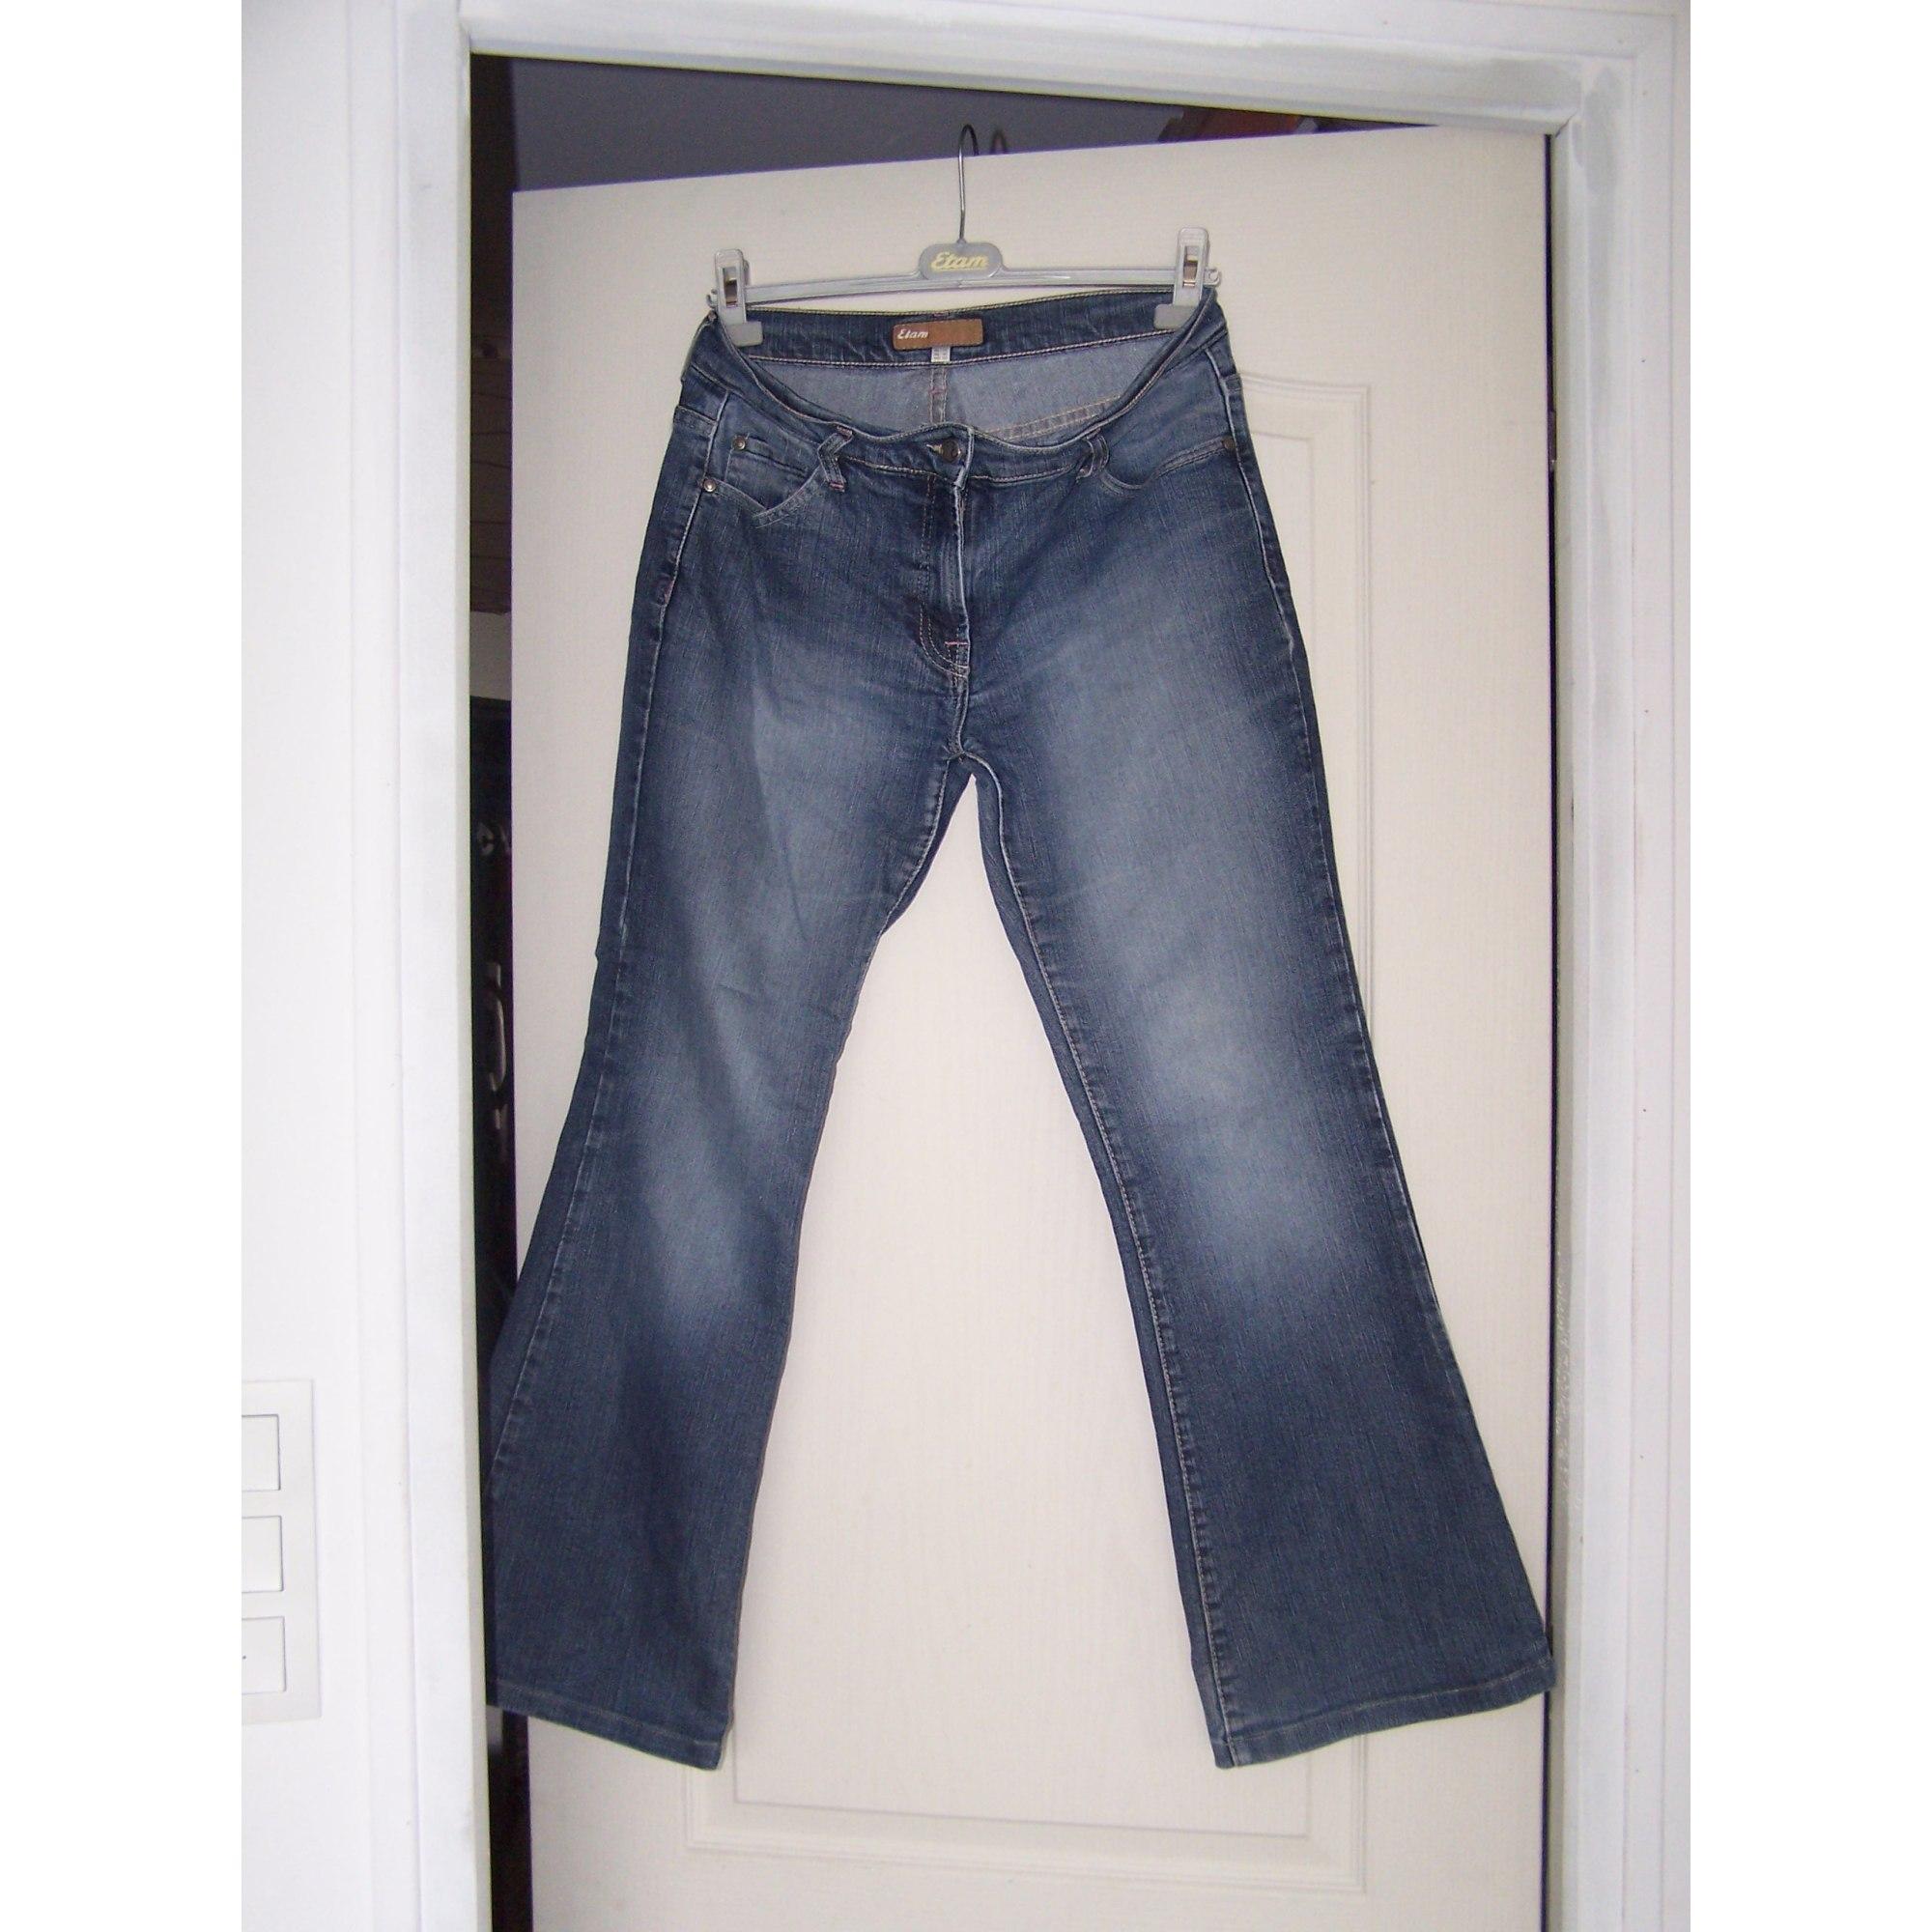 Cut t W32 Jeans Bleu Etam Boot 42 227063 Évasé qXqawErv